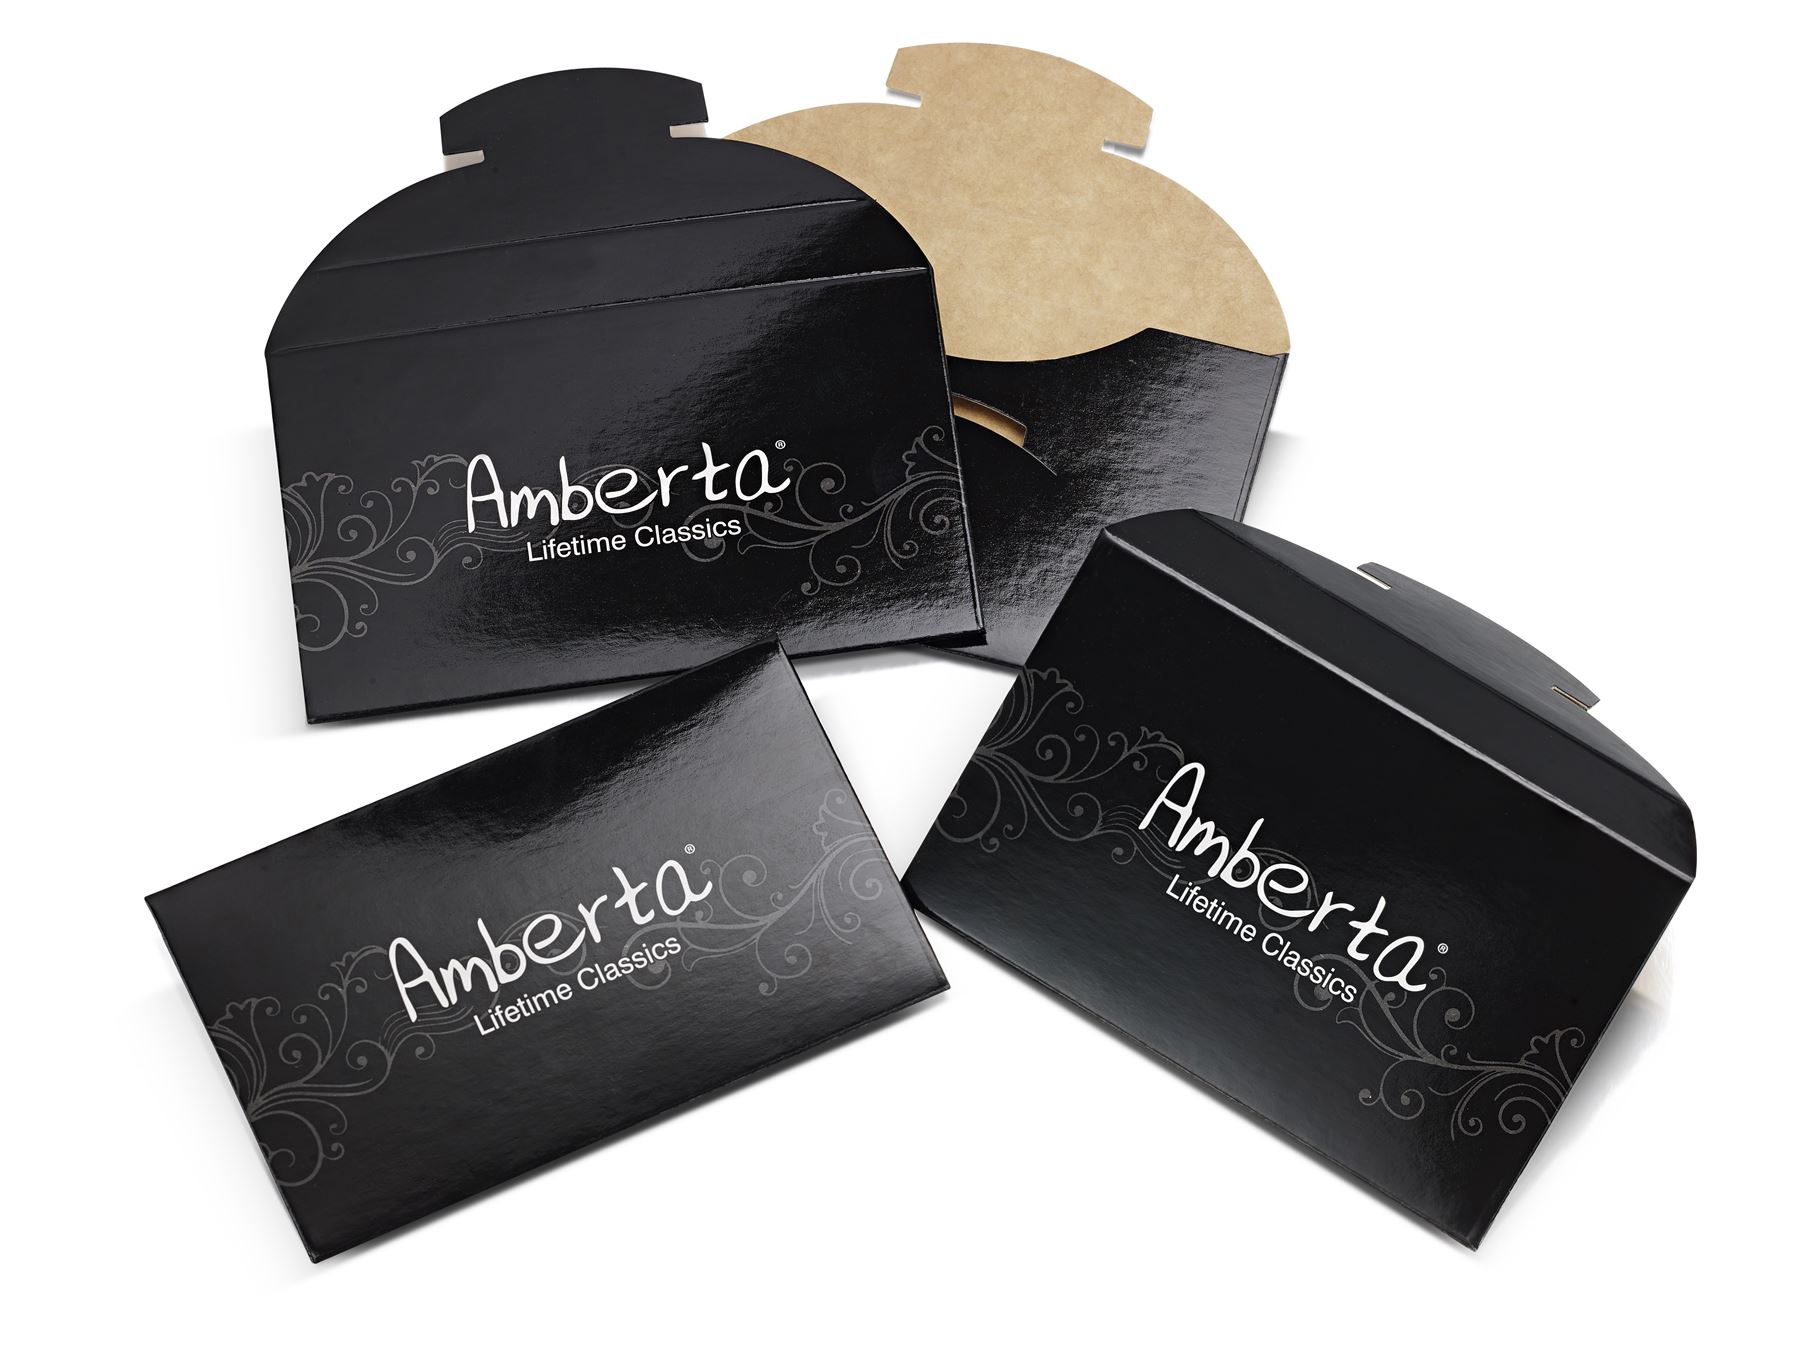 Amberta-Jewelry-925-Sterling-Silver-Adjustable-Bracelet-Italian-Bangle-for-Women miniature 46